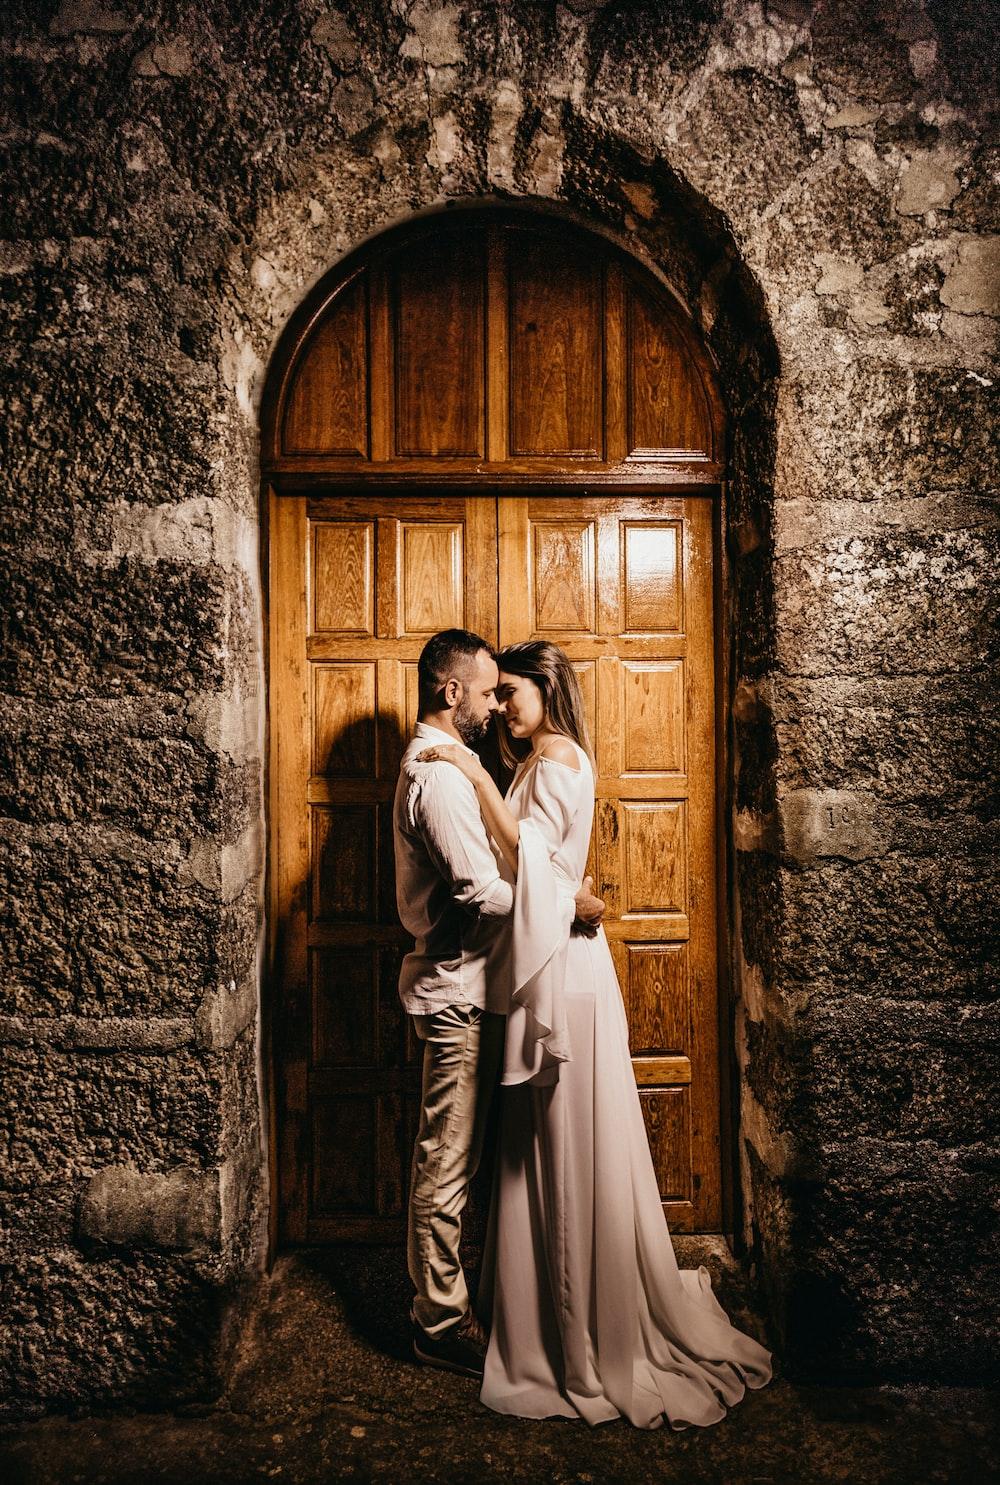 man and woman standing in front of wooden double door